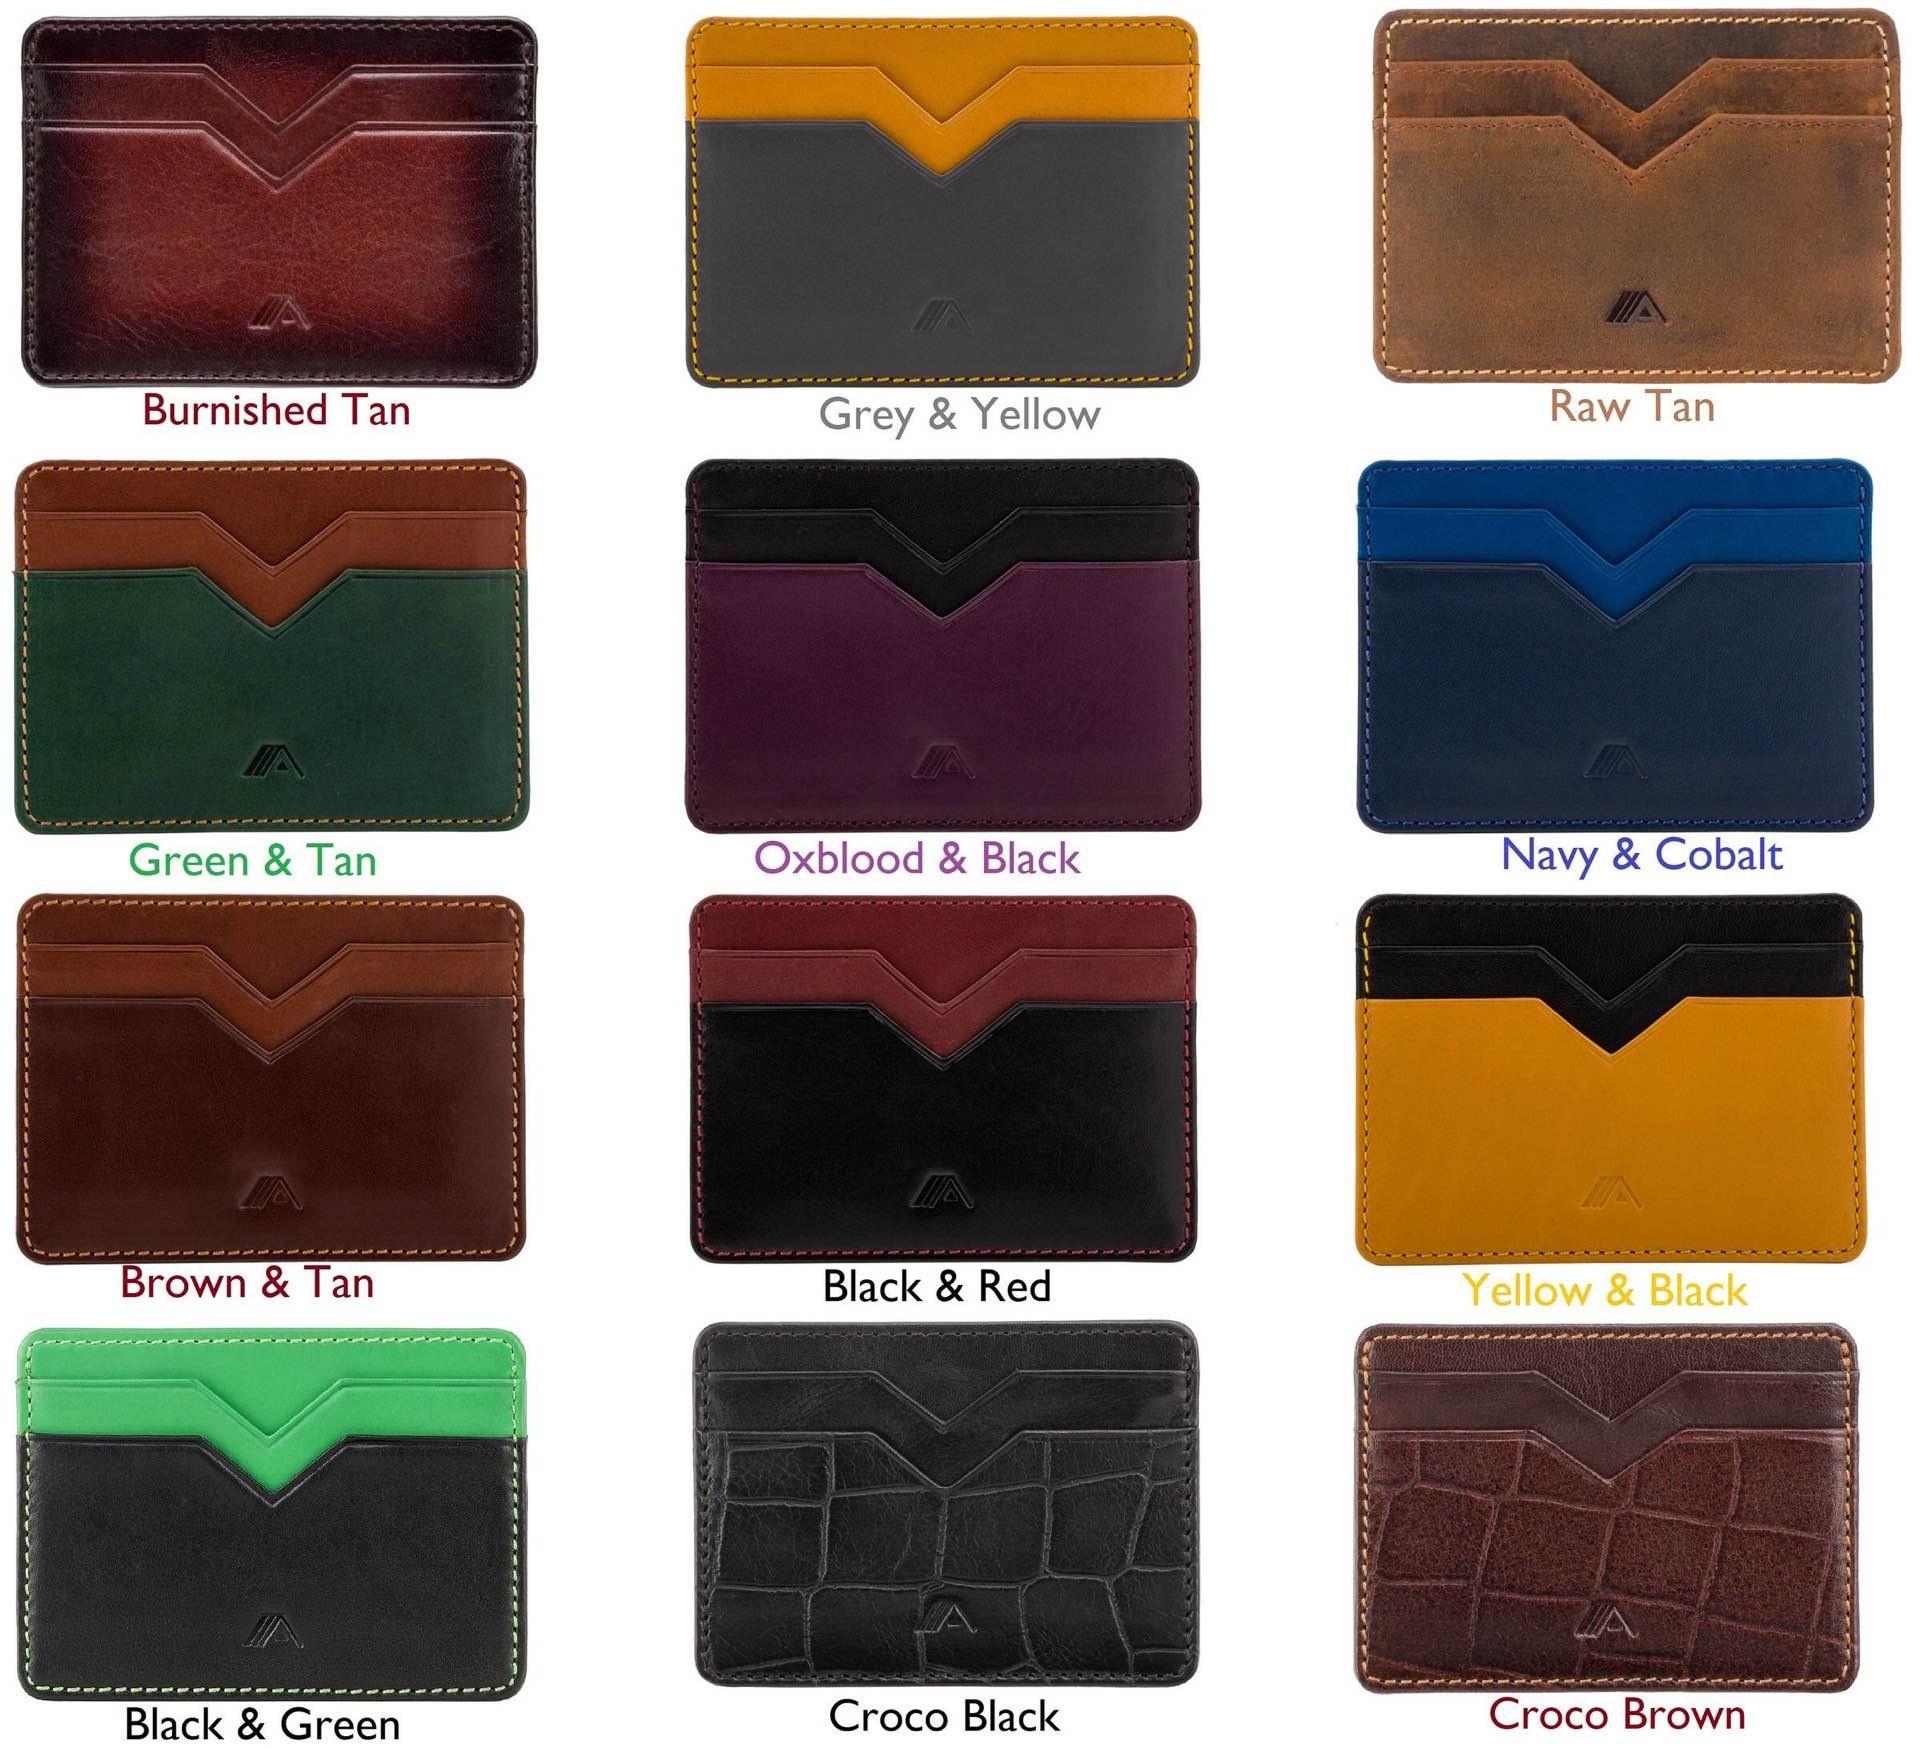 a-slim-yaiba-slim-leather-card-holder-colorways